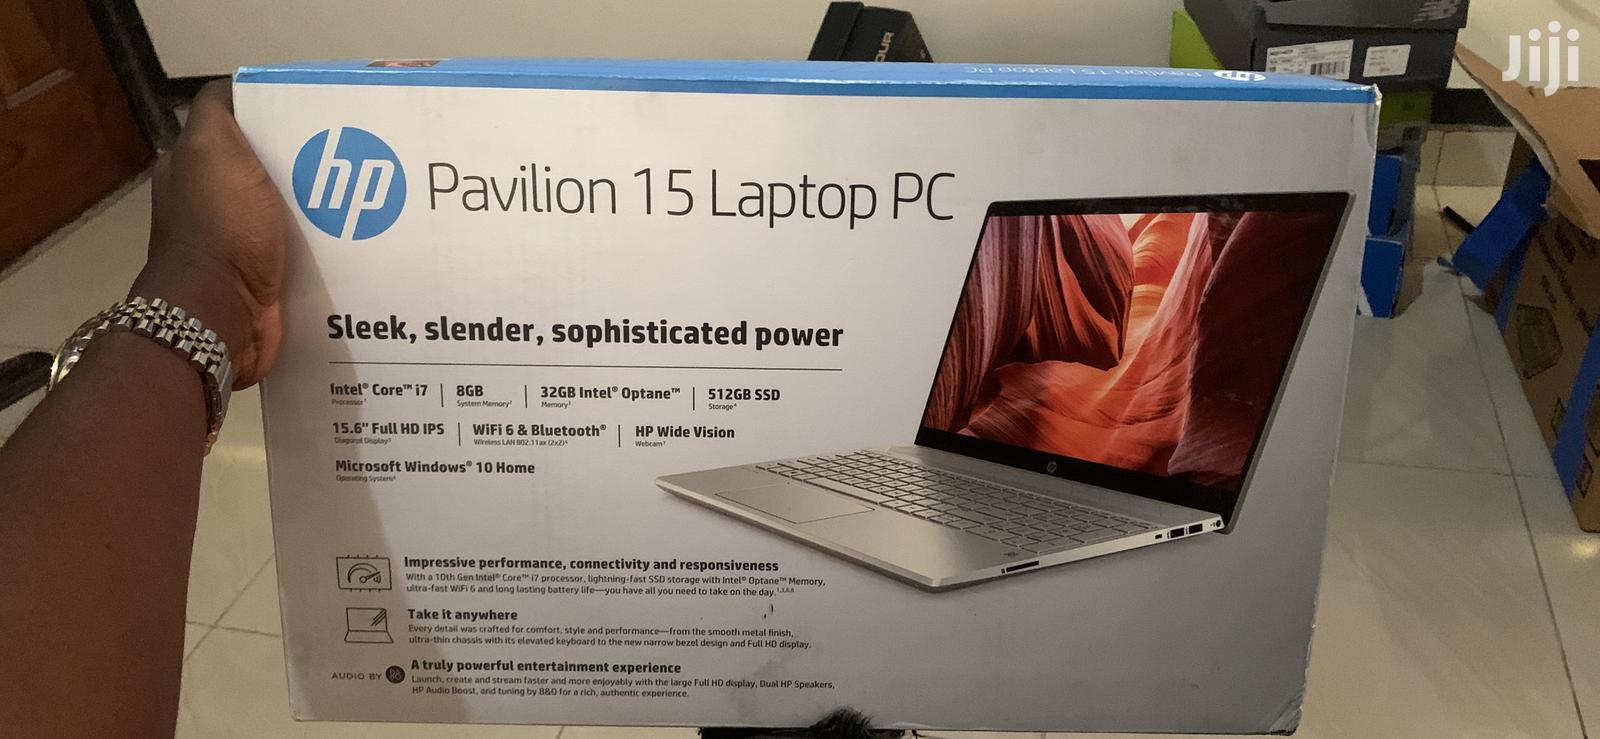 Archive: New Laptop HP Pavilion 15 8GB Intel Core i7 SSD 512GB